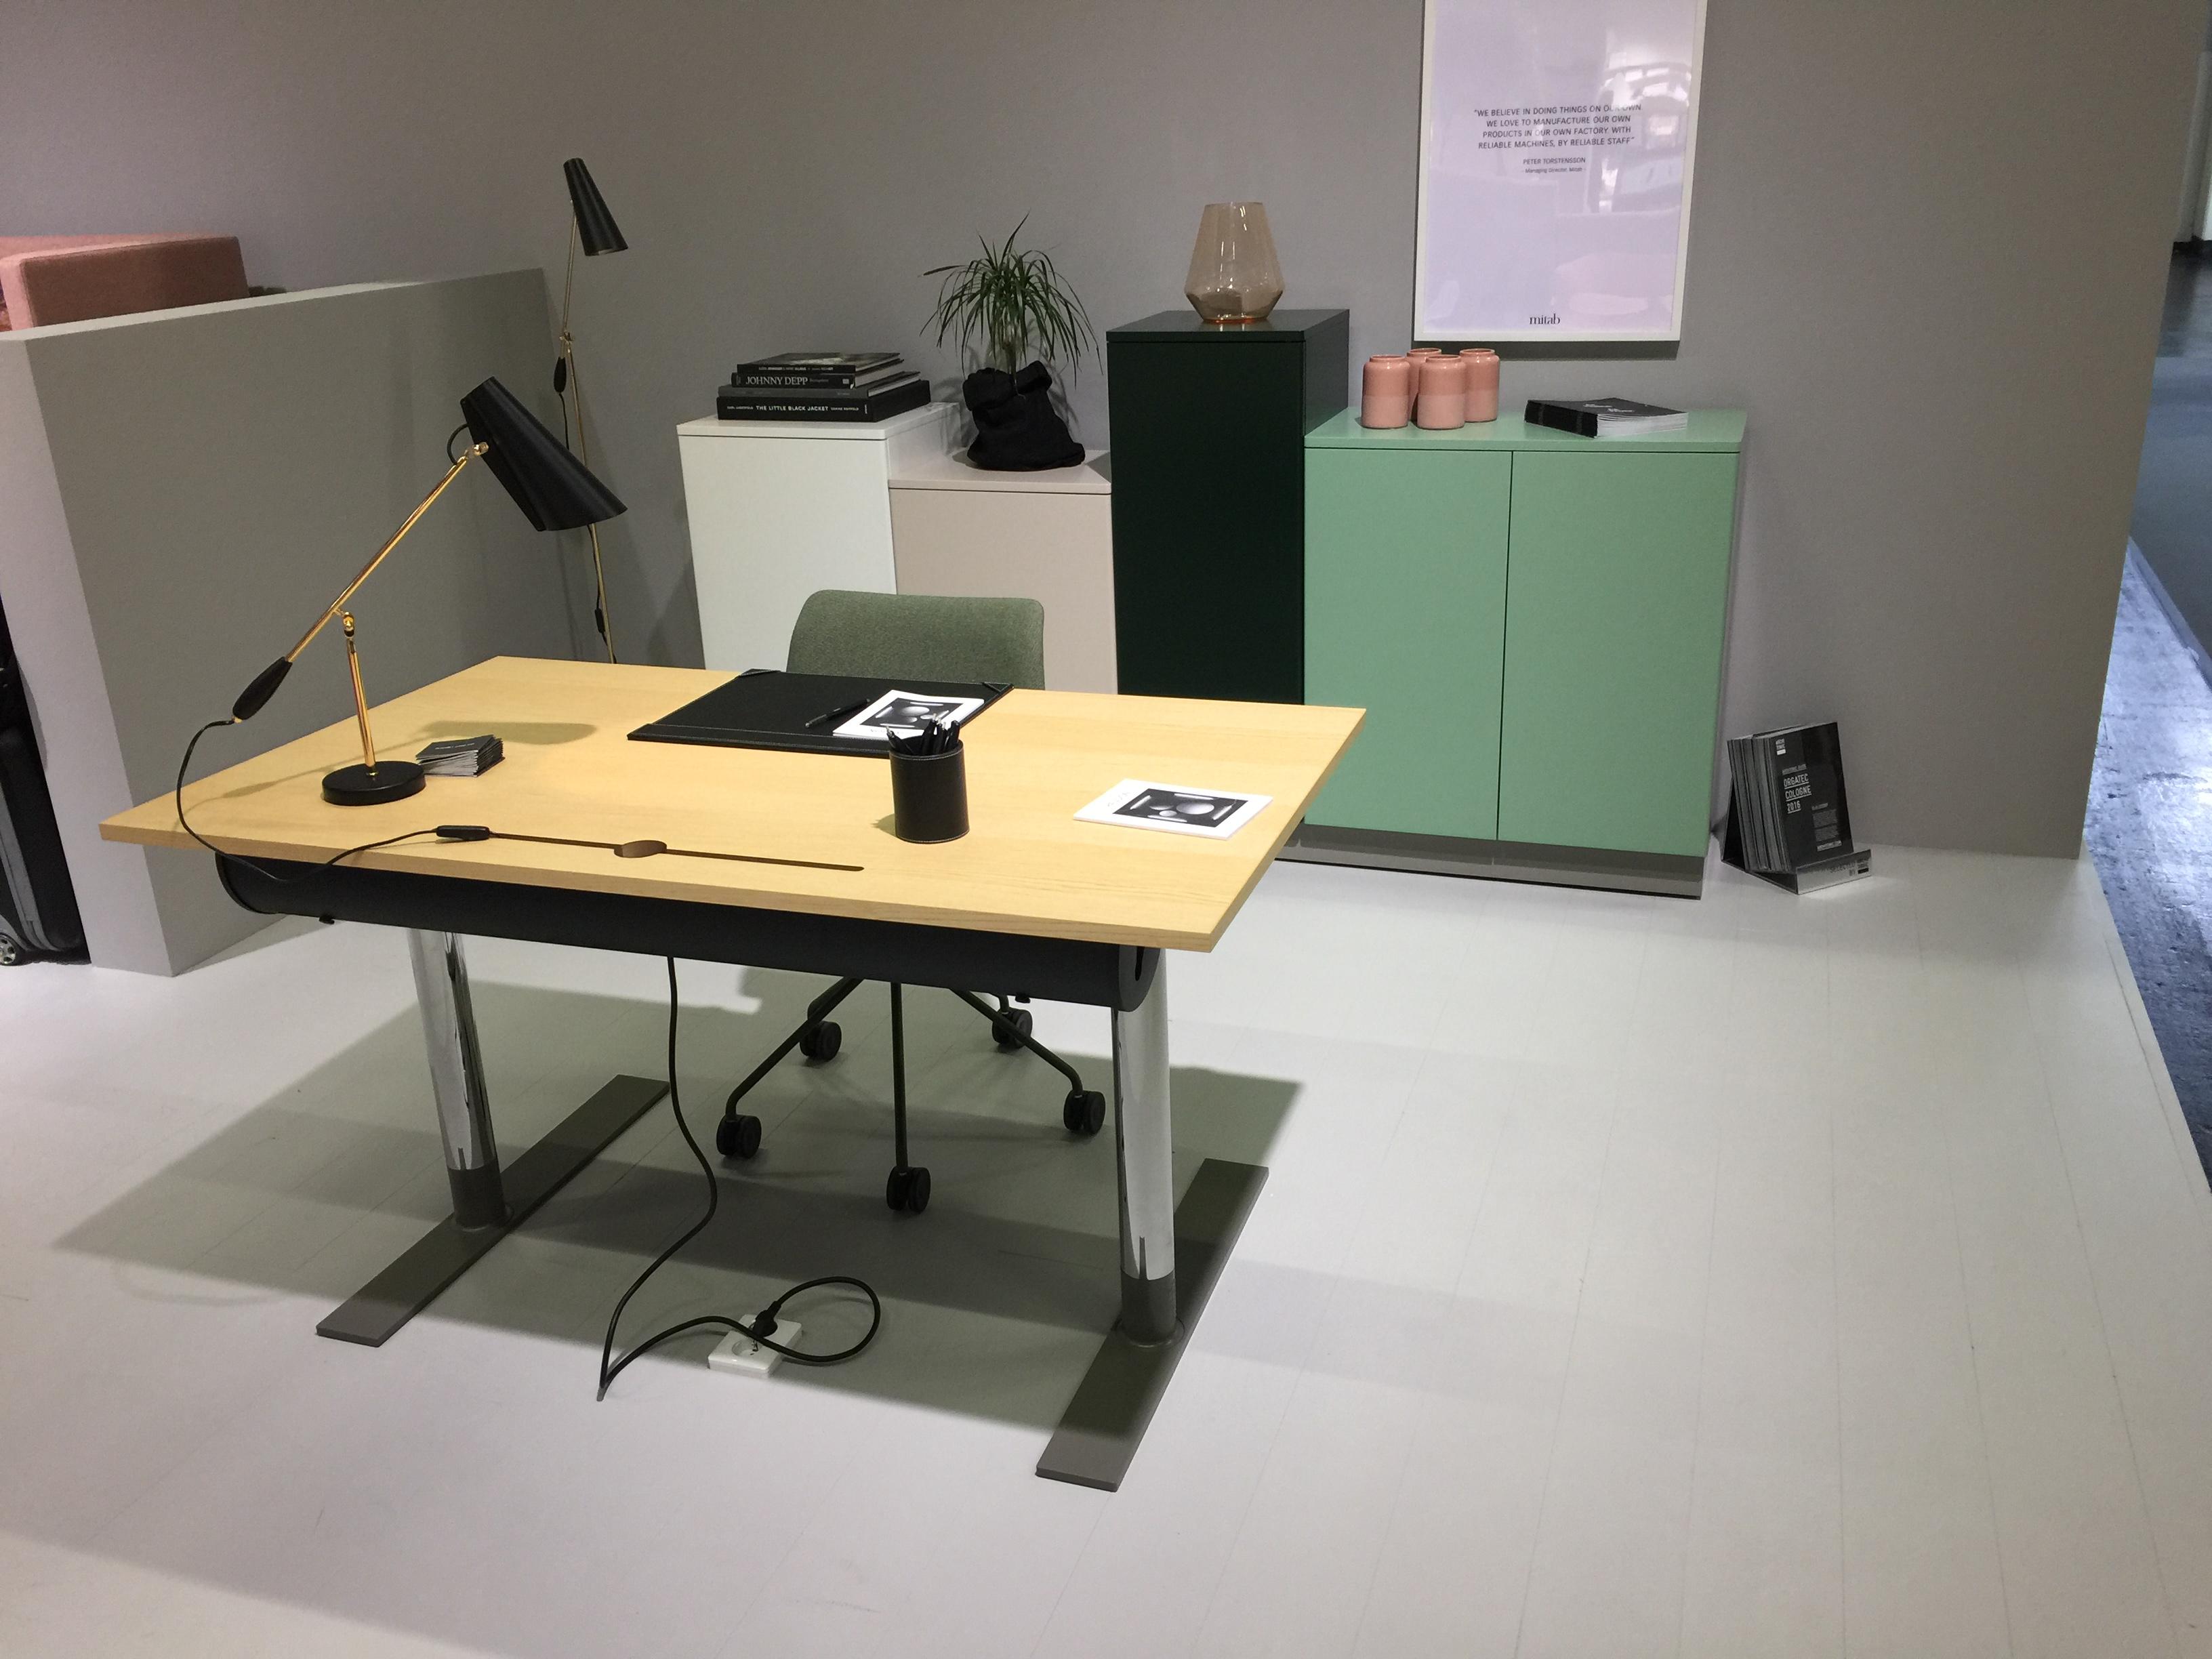 Mitab unit zit sta bureau project meubilair zit sta bureau for Bureau zit sta